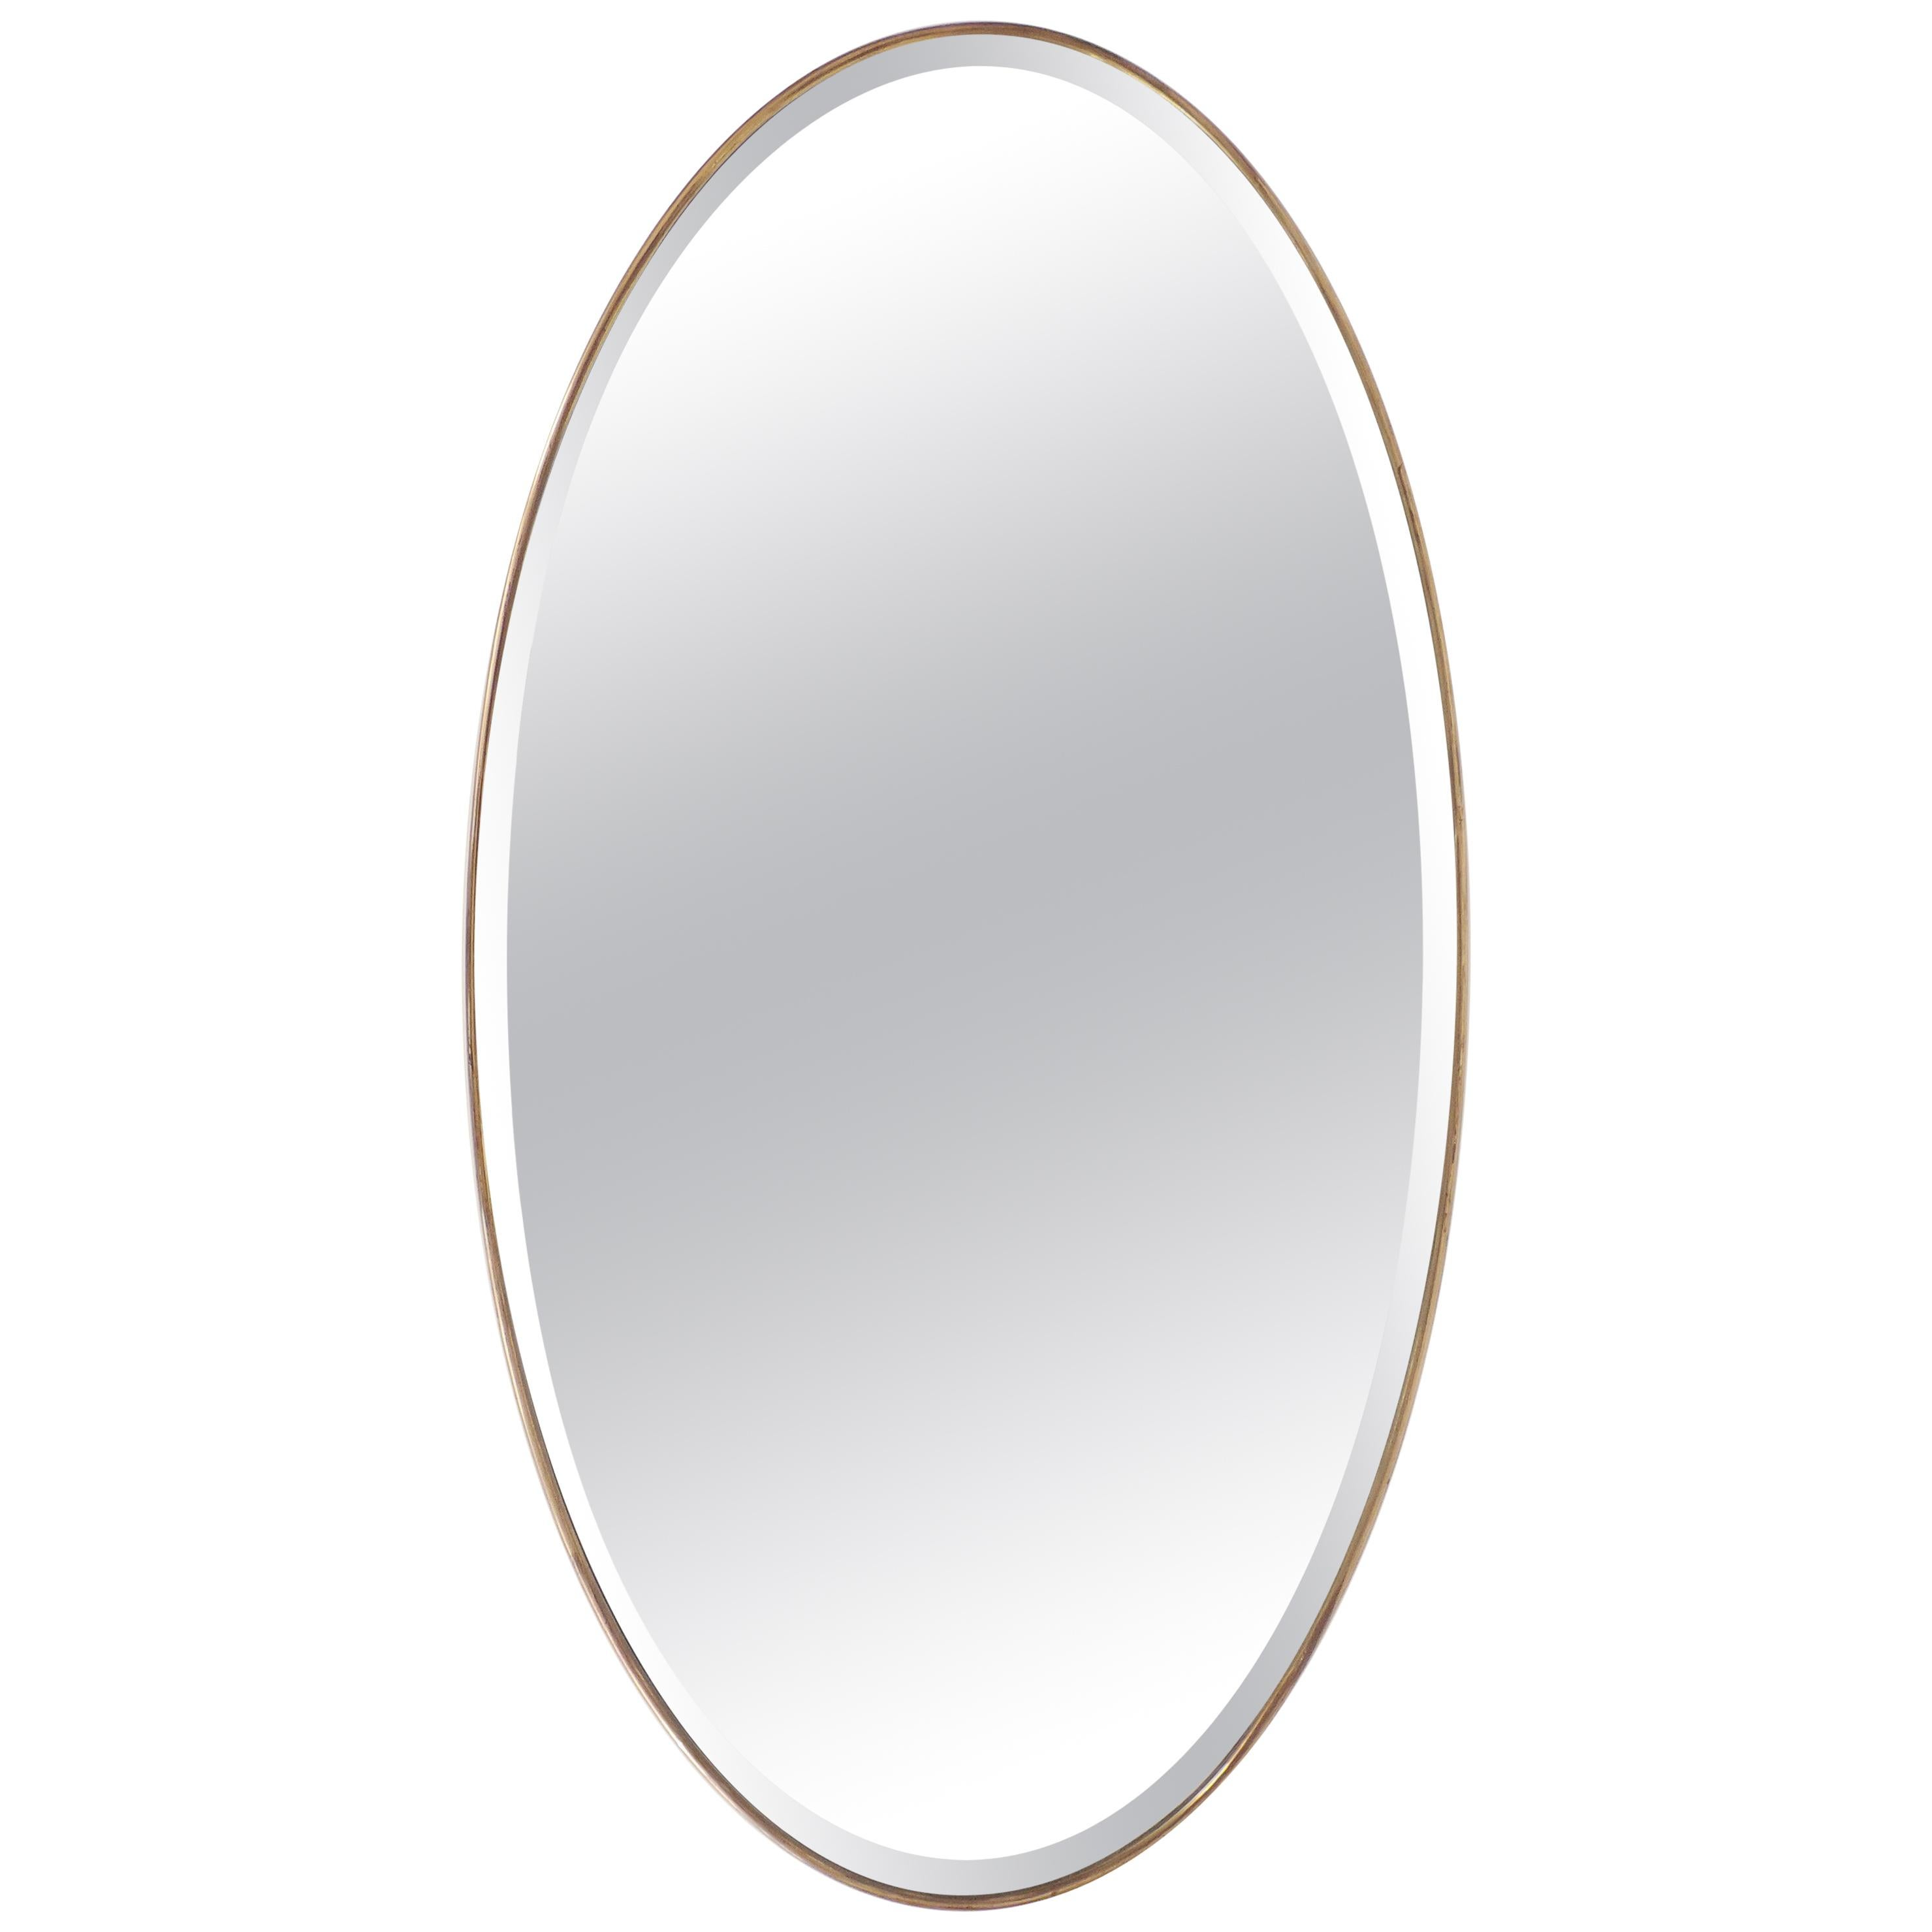 Italian 1950s Oval Brass Framed Glass Mirror